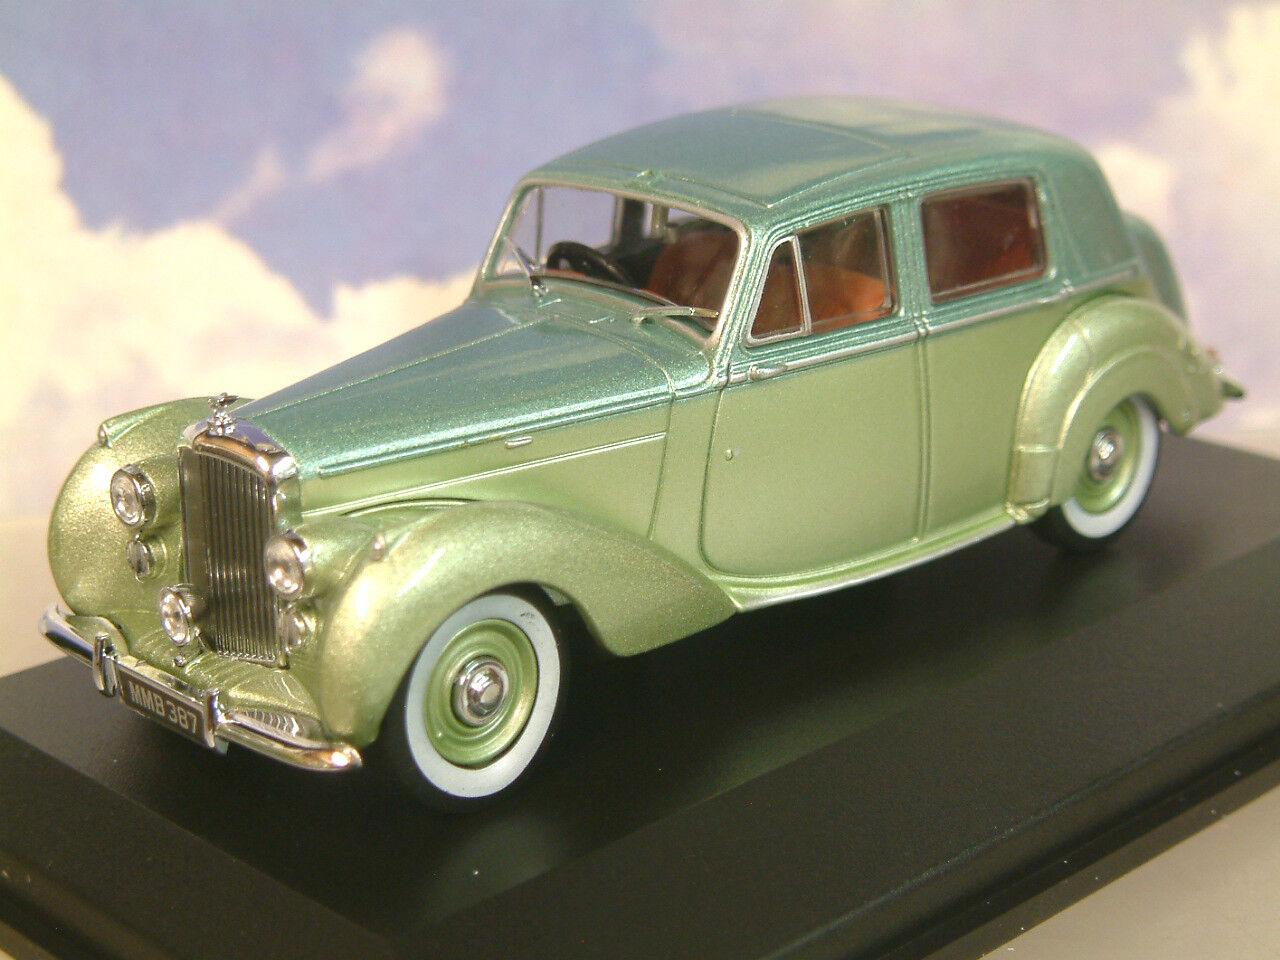 Oxford Diecast 1 43 1946-1952 Bentley Mkvi Mk6 Berline Balmoral   Glace Vert